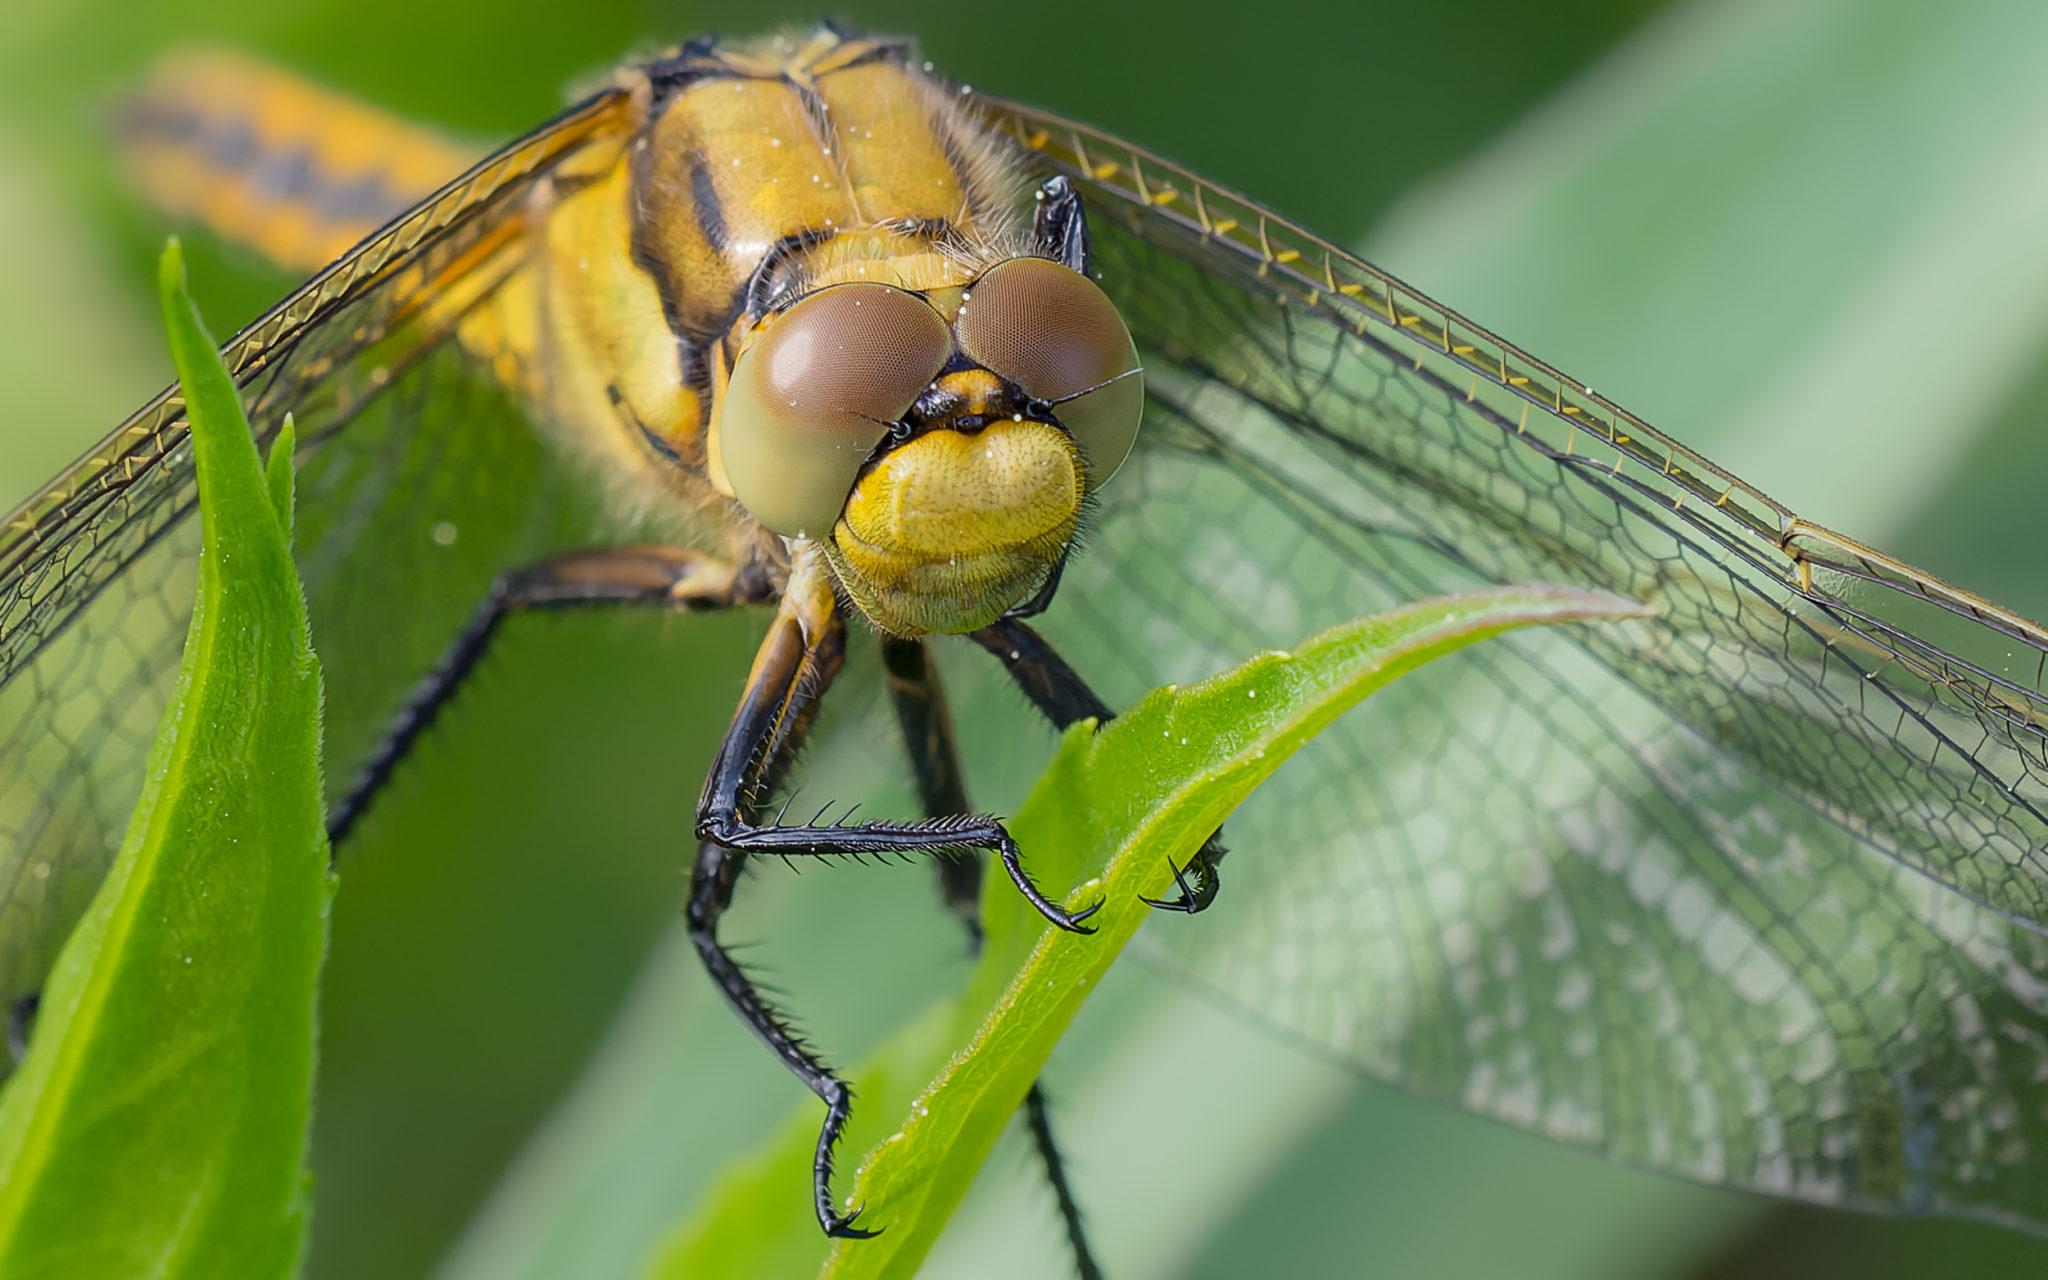 Libellenporträt, Naturfotografie Olaf & Sylvia Rentzsch